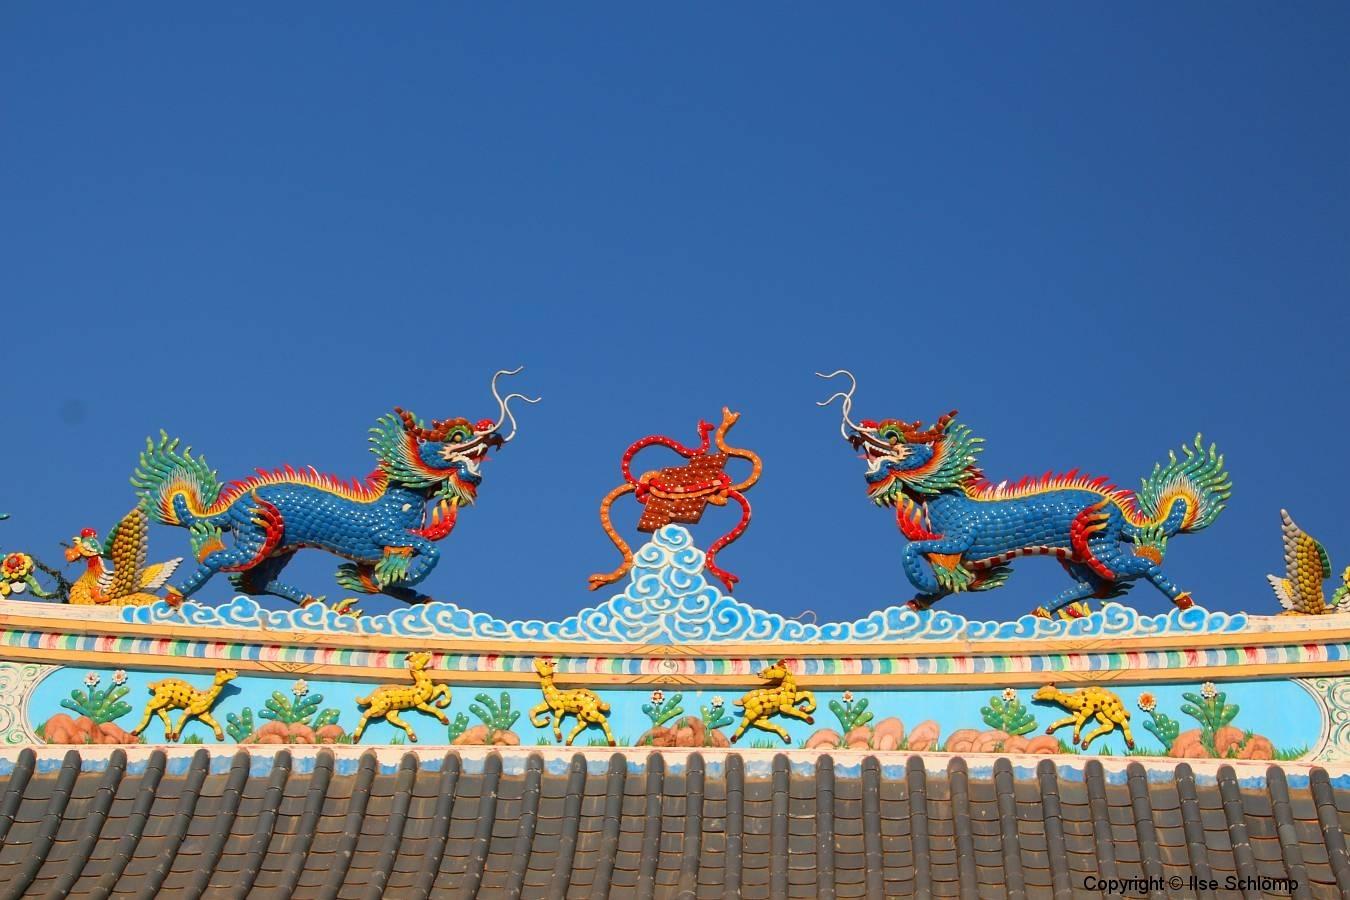 Laos, Vientiane, Chinesischer Tempel Ho Kang